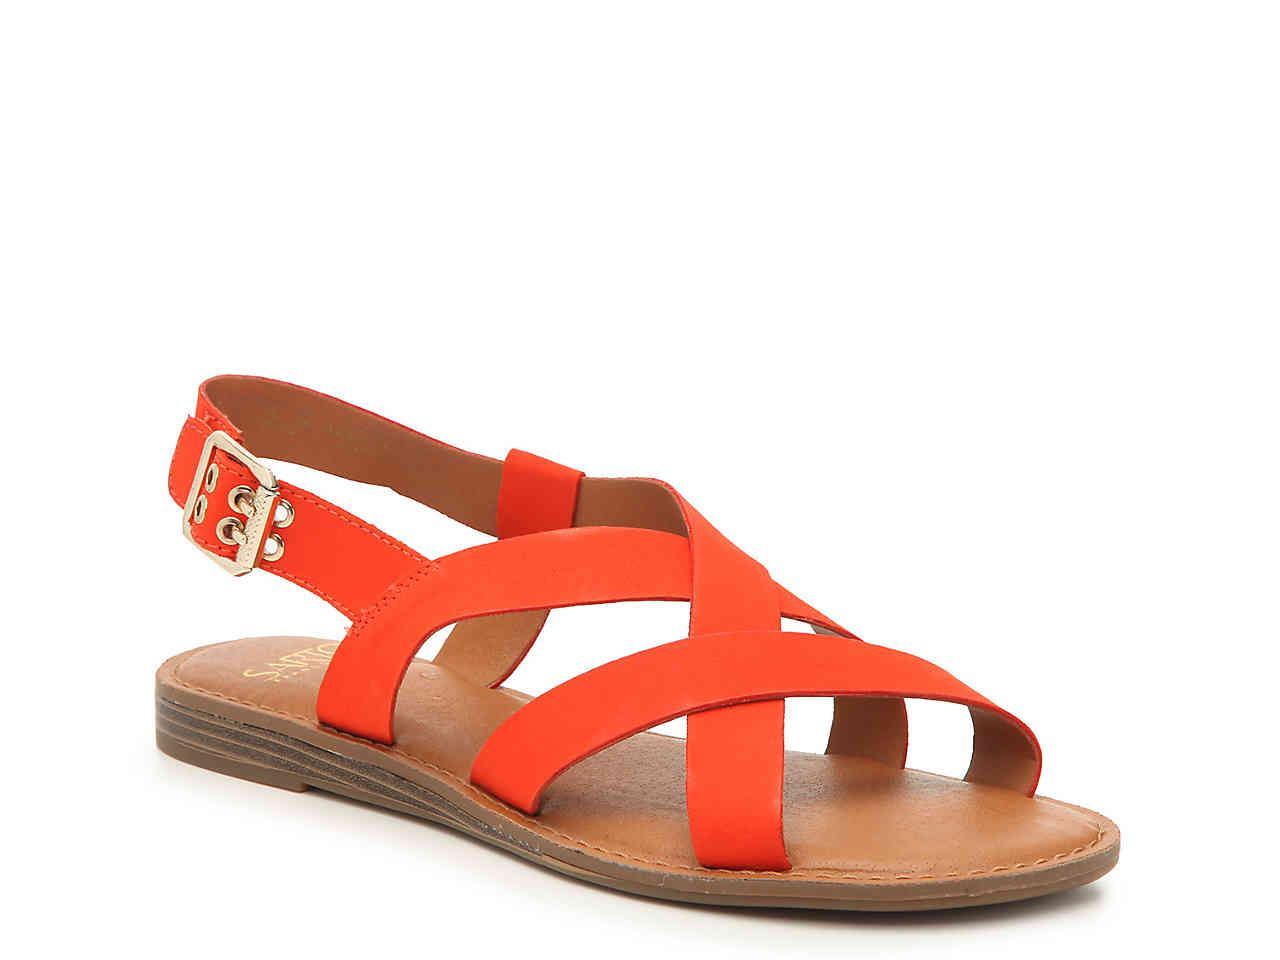 3405c949c54088 Lyst - Franco Sarto Galavant Sandal in Orange